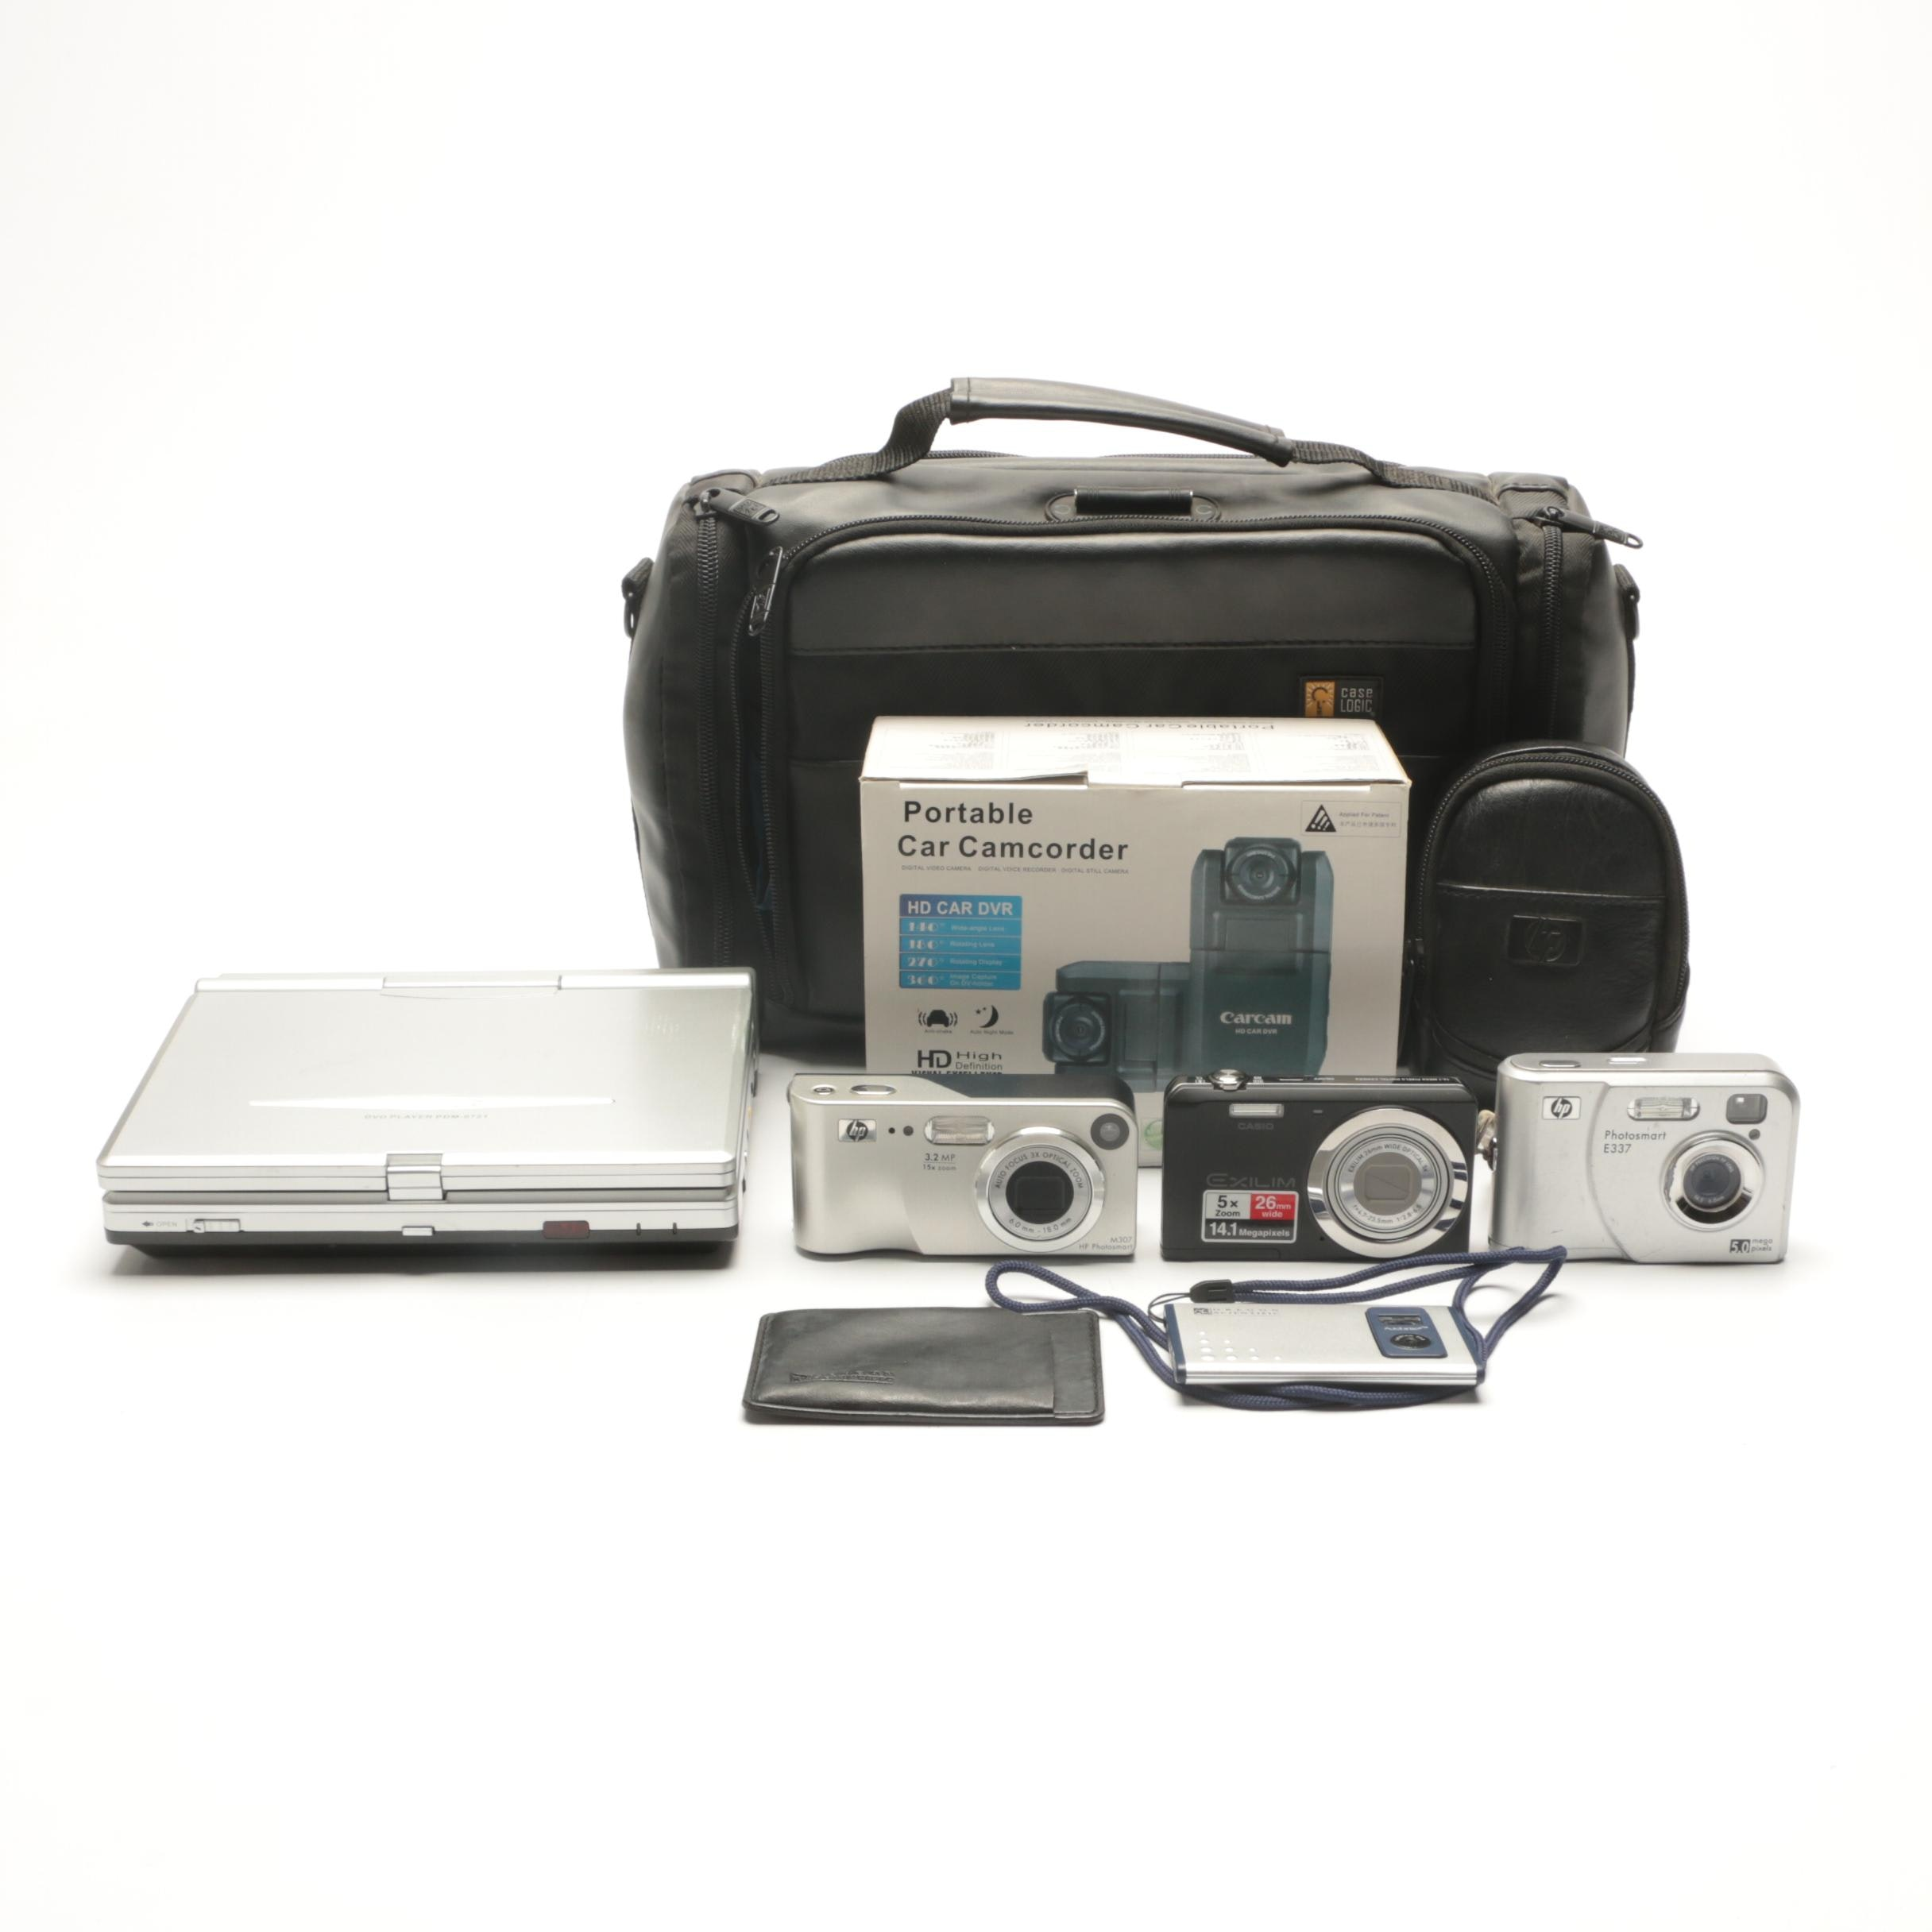 Digital Cameras Including Casio, Hp Photosmart, Oregon Scientific and More